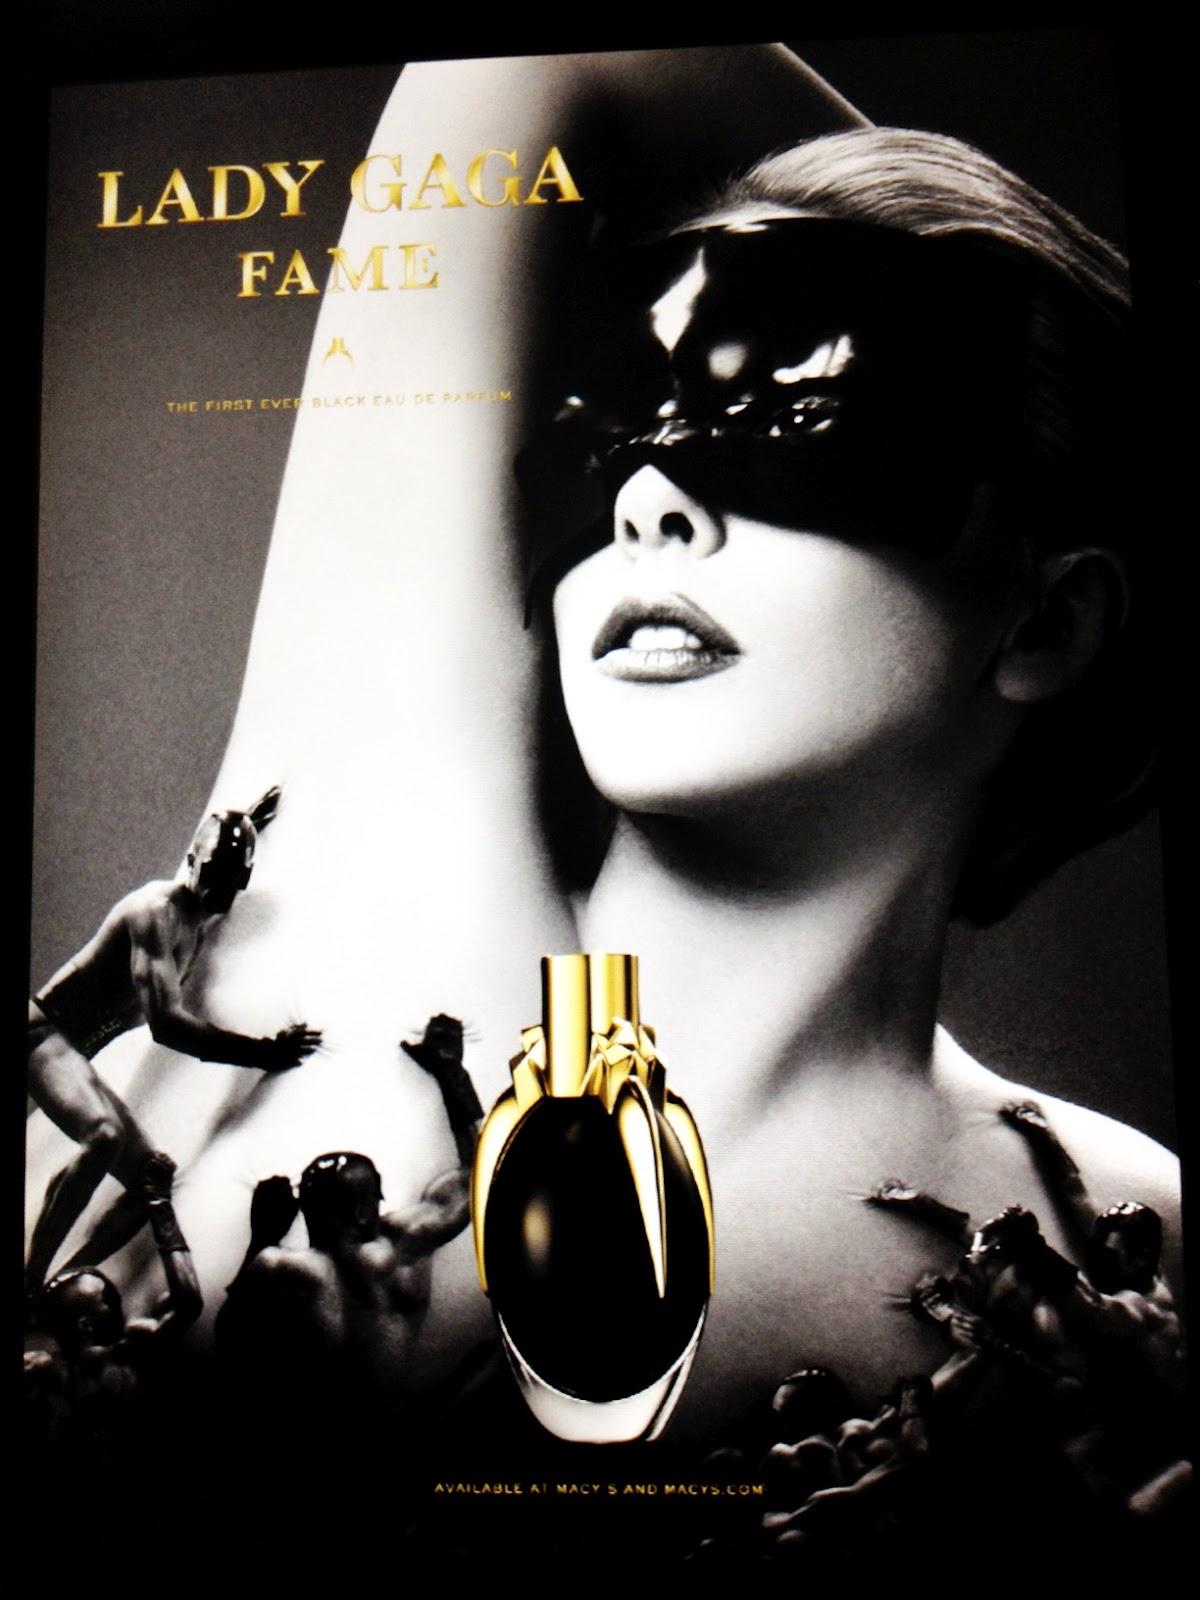 http://2.bp.blogspot.com/-aEGTKY_LC34/UCx_-NJ5qtI/AAAAAAAAARA/Ci9g0bk0FLo/s1600/lady+gaga+new+black+perfume+fame+post+by+cynthia+rudiyanto_exposure.JPG